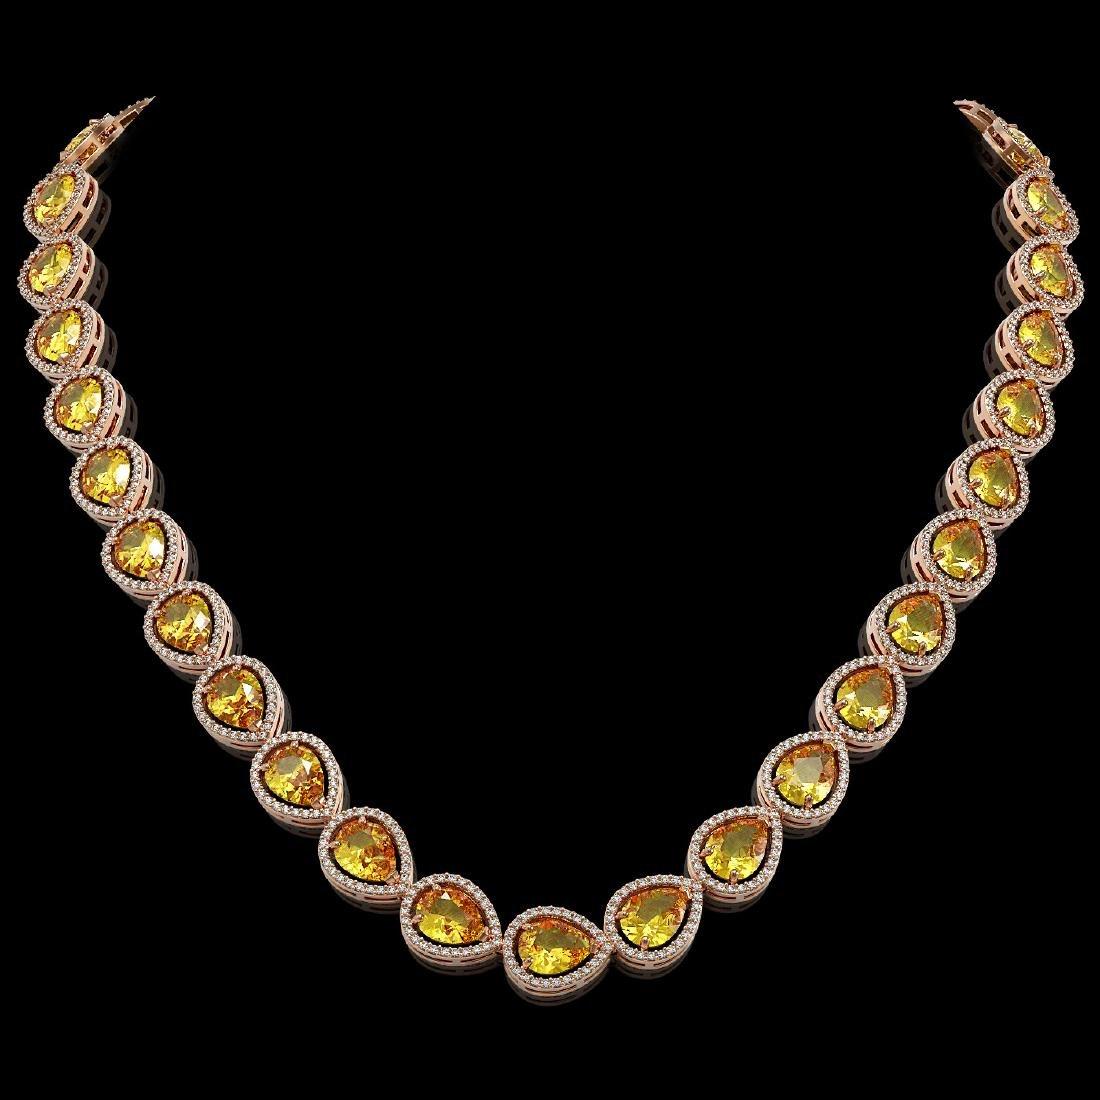 36.8 CTW Fancy Citrine & Diamond Halo Necklace 10K Rose